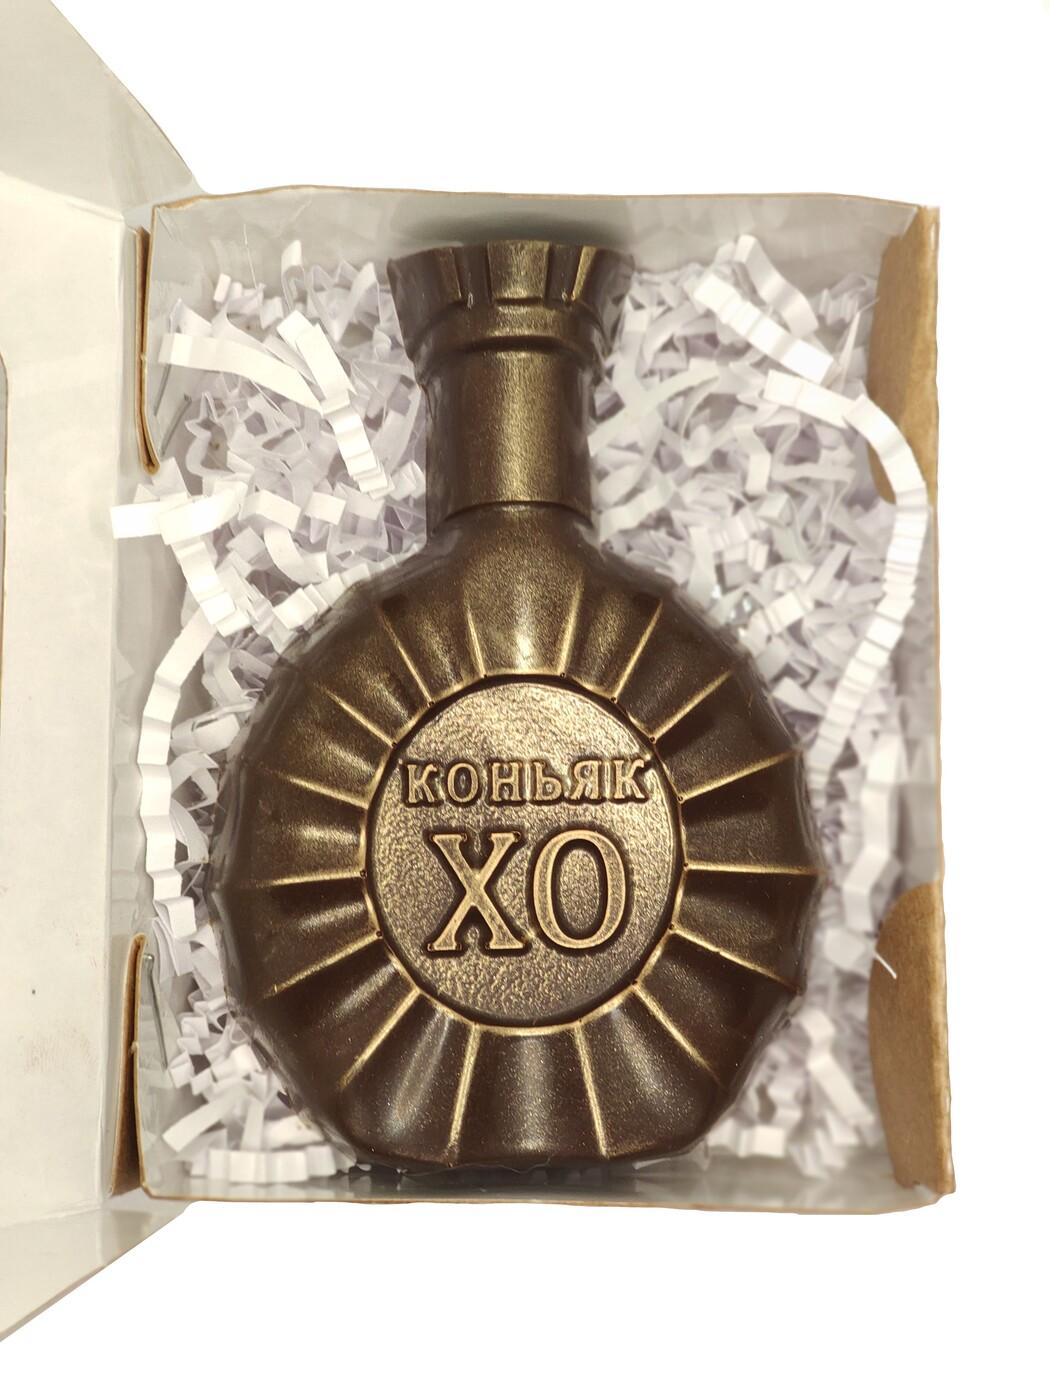 "Шоколад фигурный ""Бутылка Коньяк XO"" 40 гр."